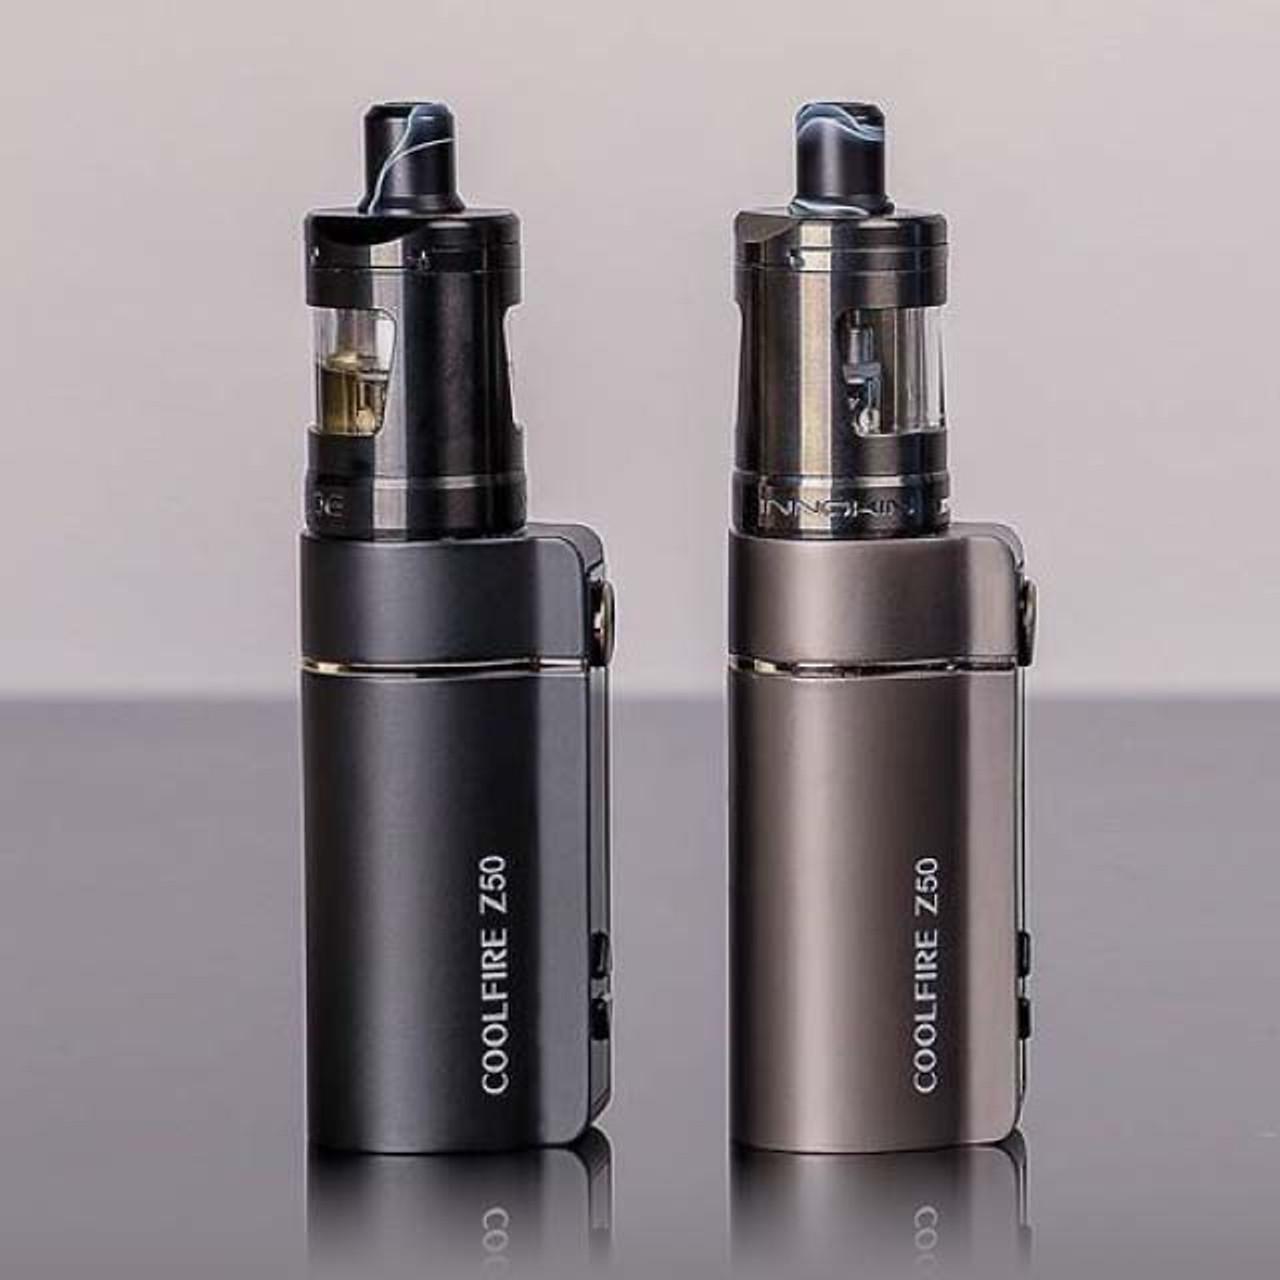 Innokin Coolfire Z50 mod kit